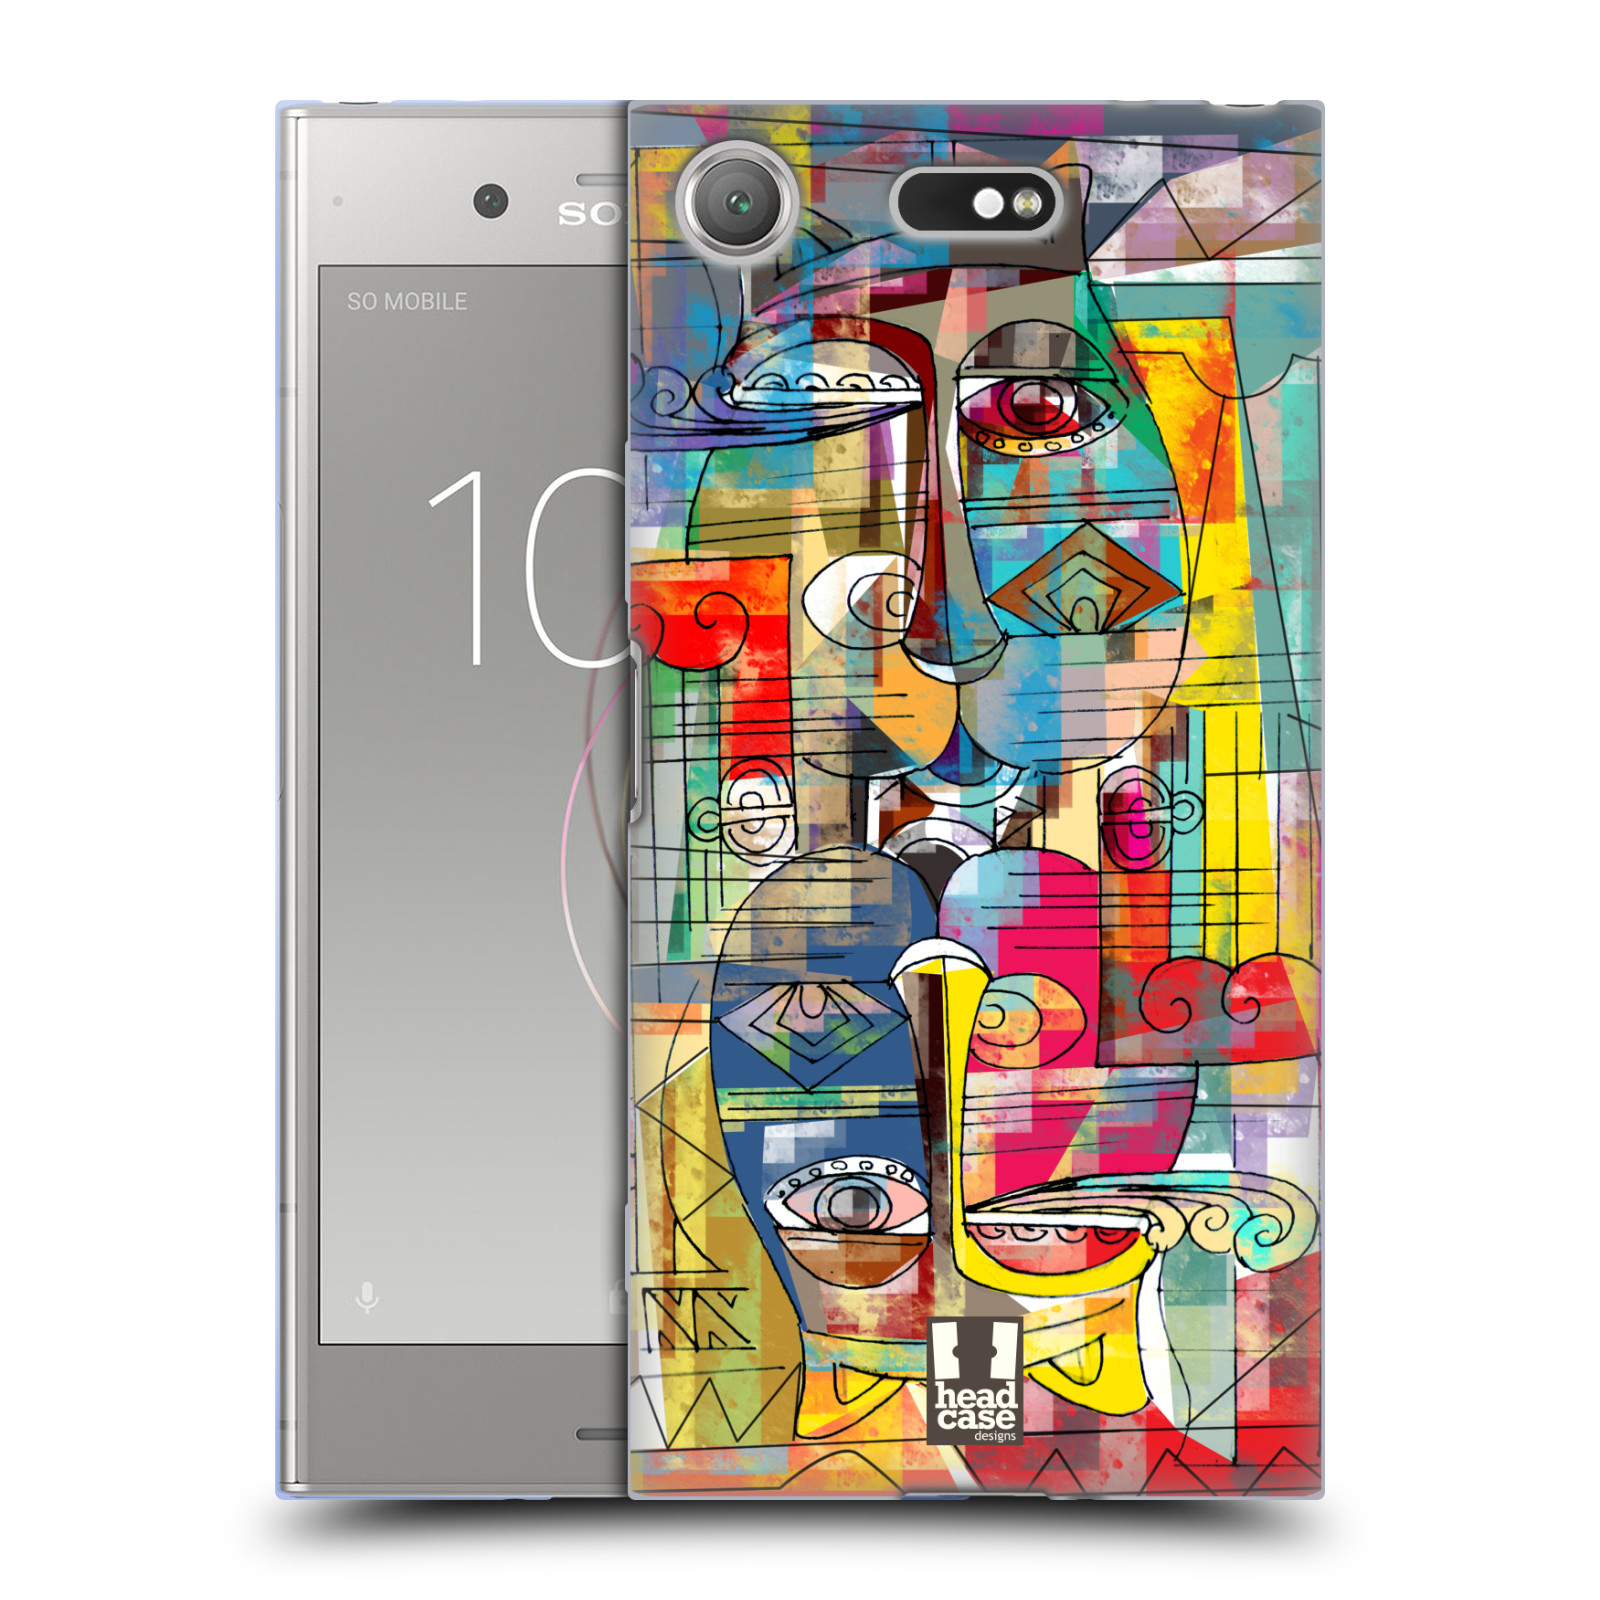 Silikonové pouzdro na mobil Sony Xperia XZ1 Compact - Head Case - AZTEC MANX